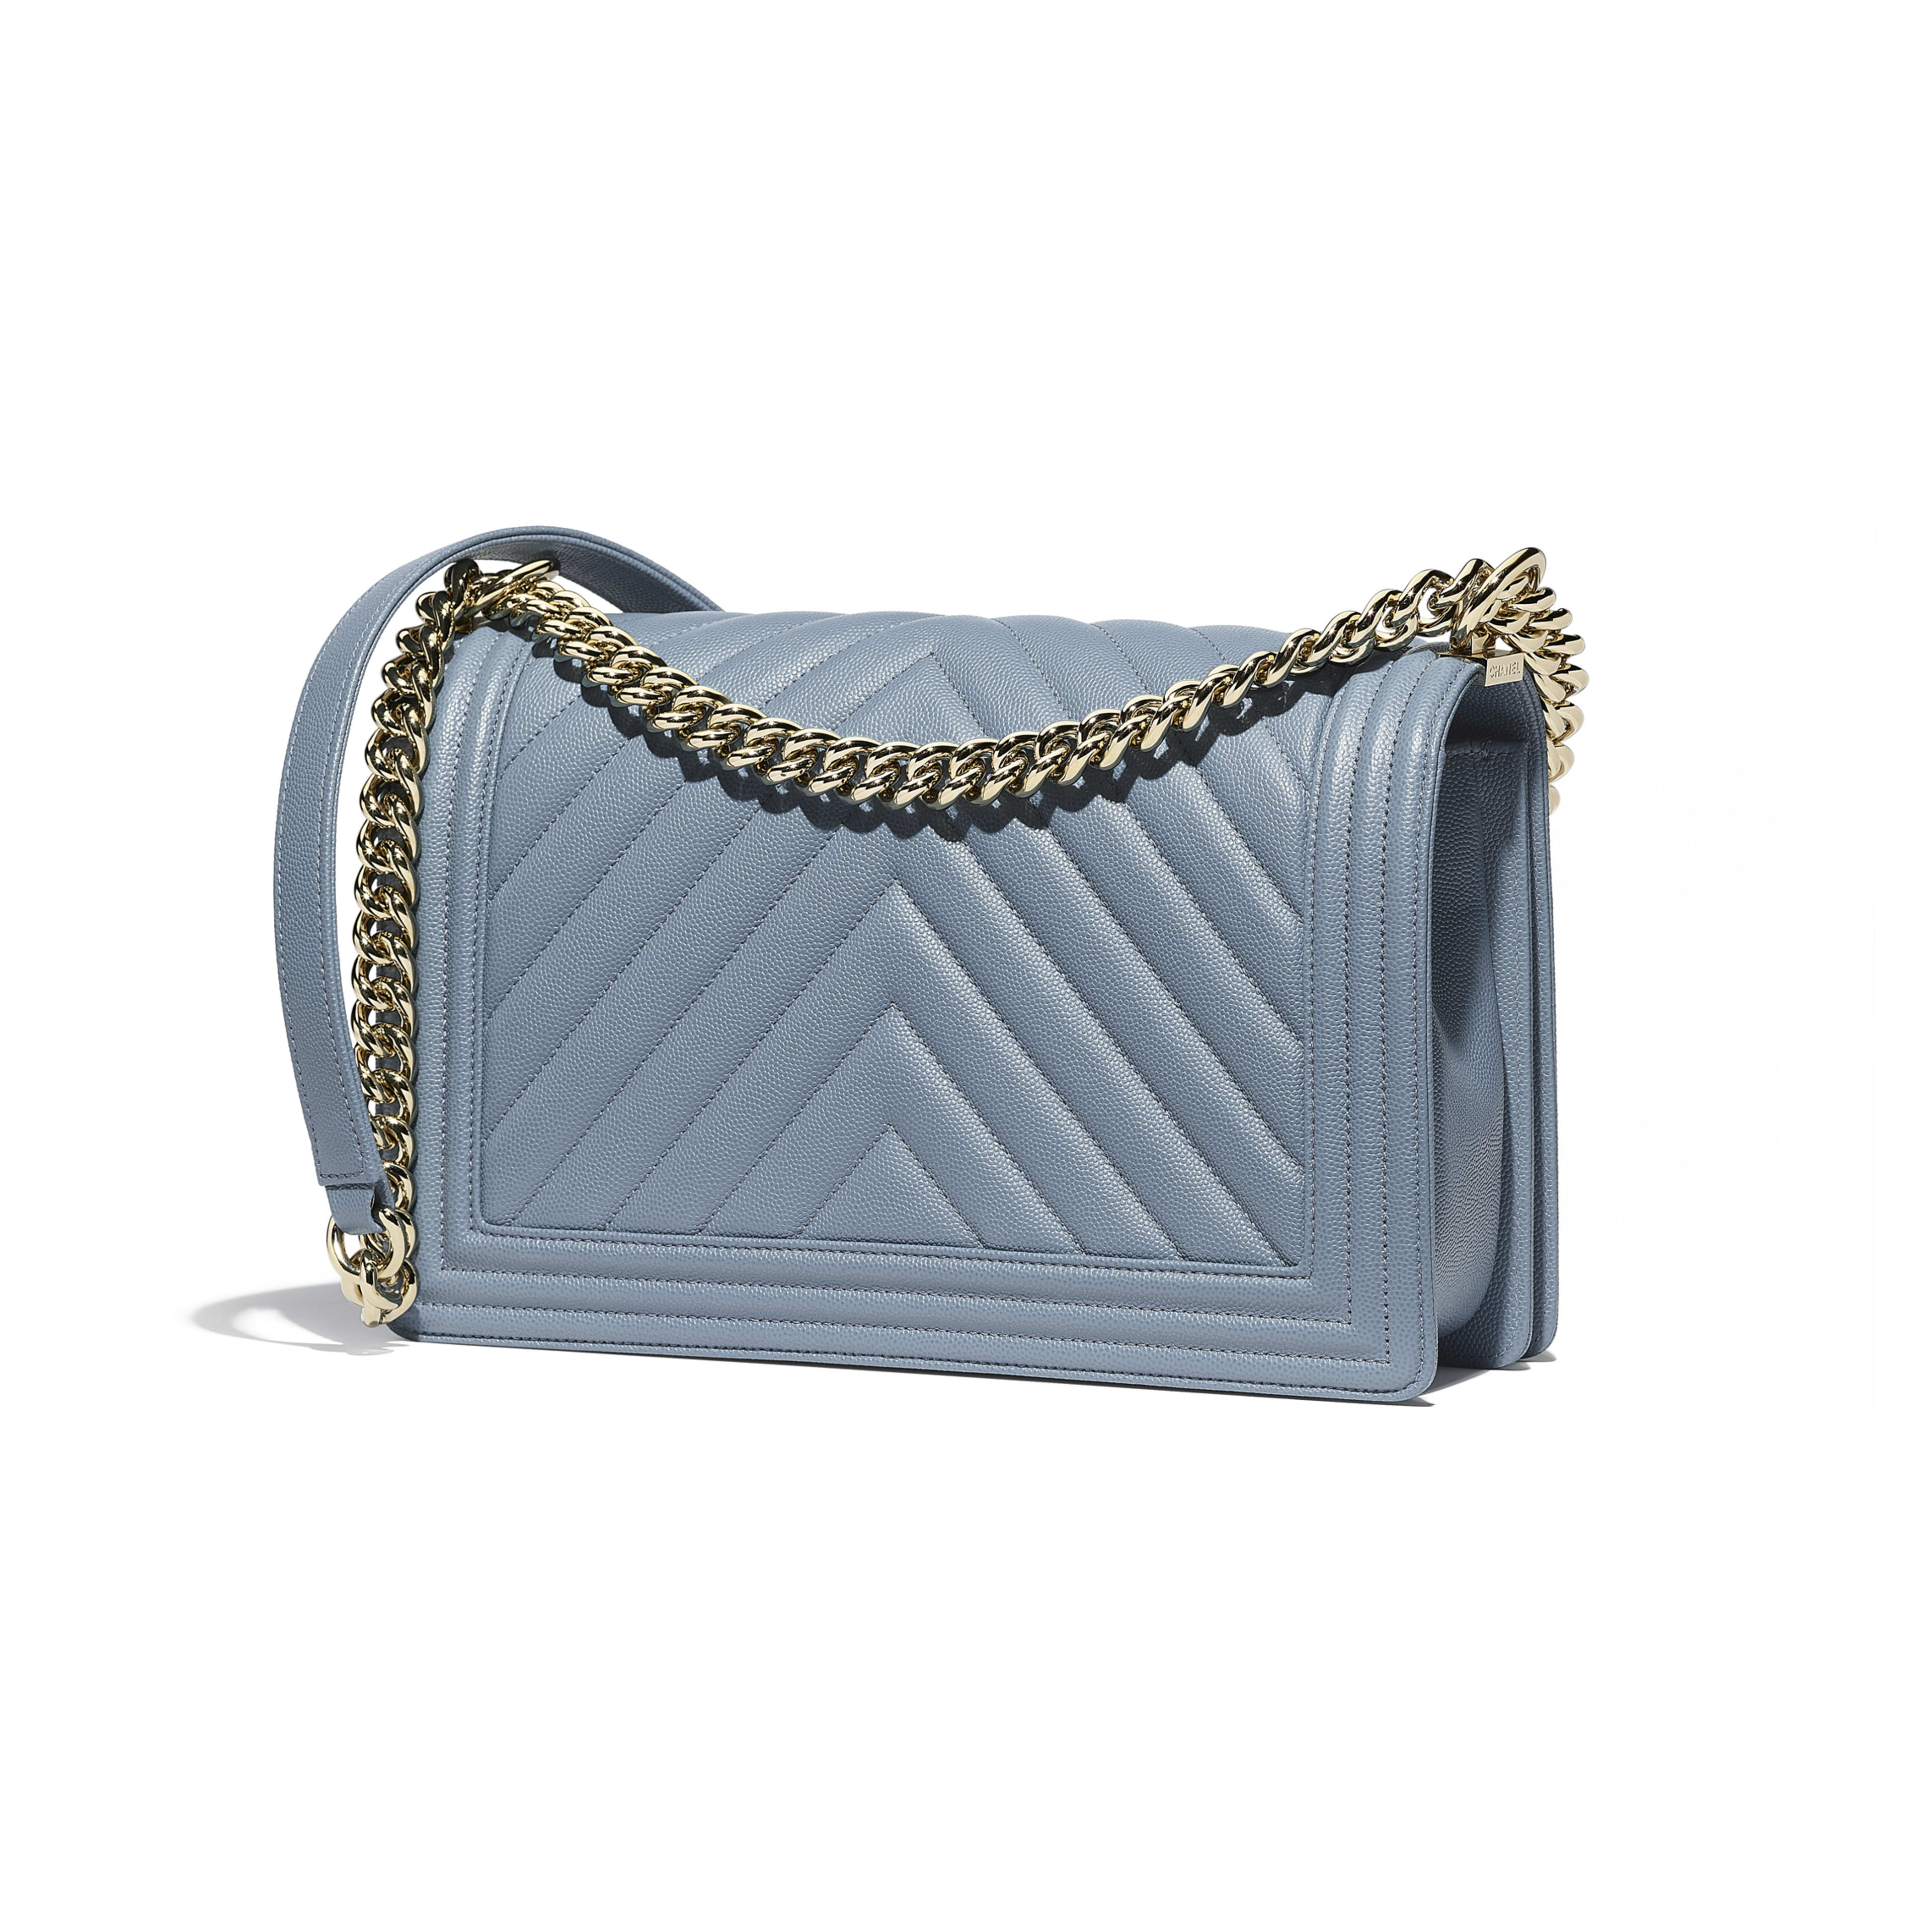 48e03ec9e52ca6 Grained Calfskin & Gold-Tone Metal Blue Large BOY CHANEL Handbag   CHANEL